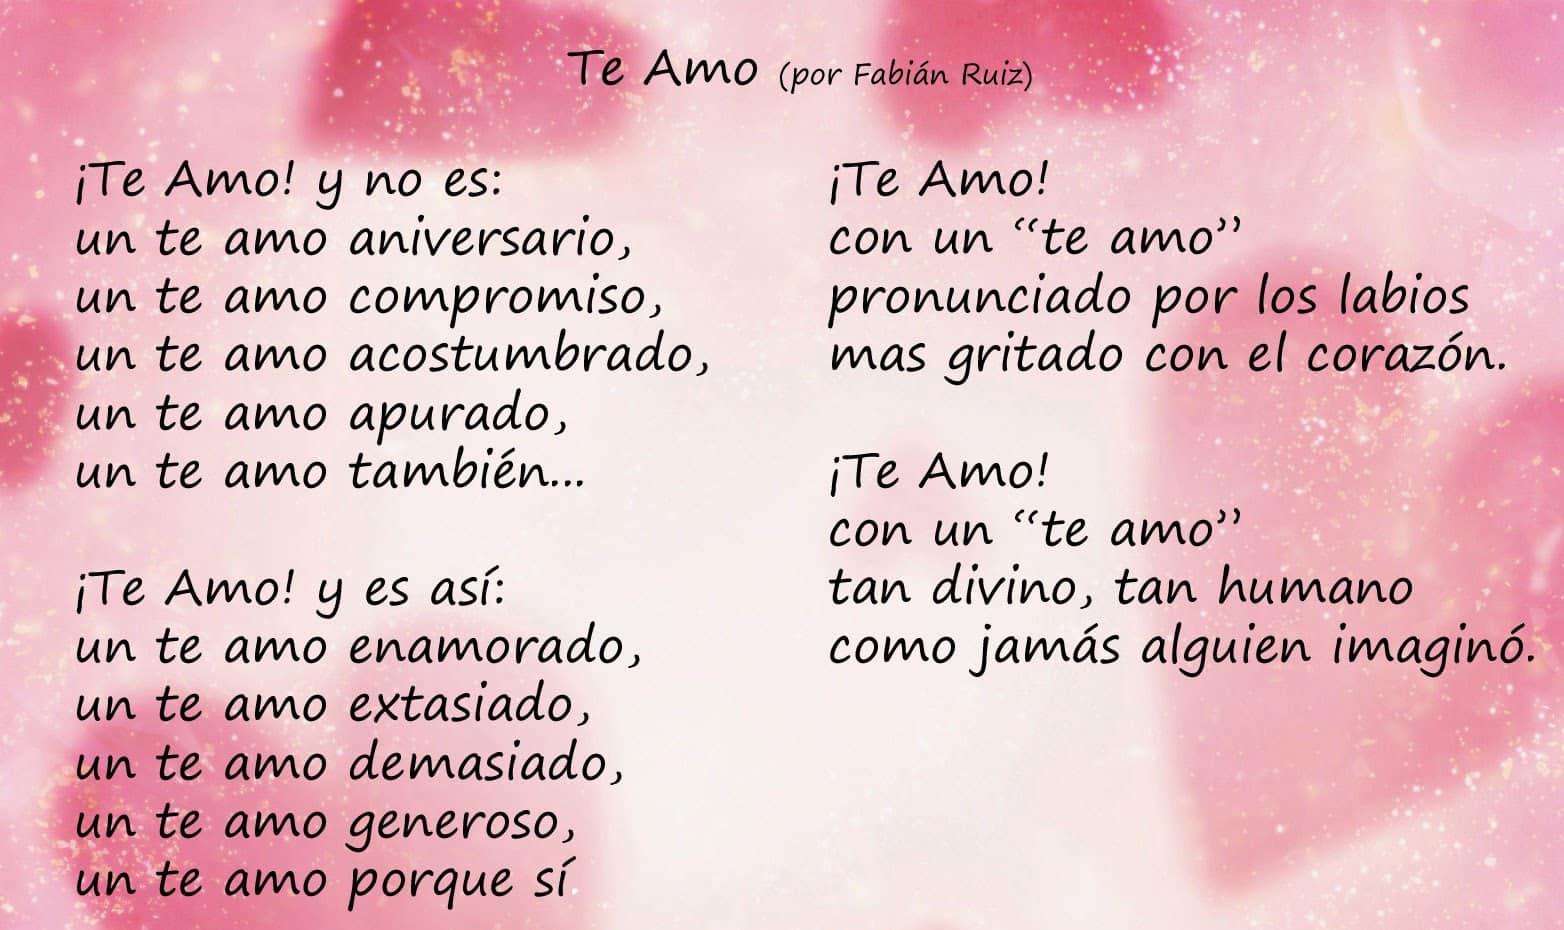 Poemas poco conocidos largos de amor [PUNIQRANDLINE-(au-dating-names.txt) 34